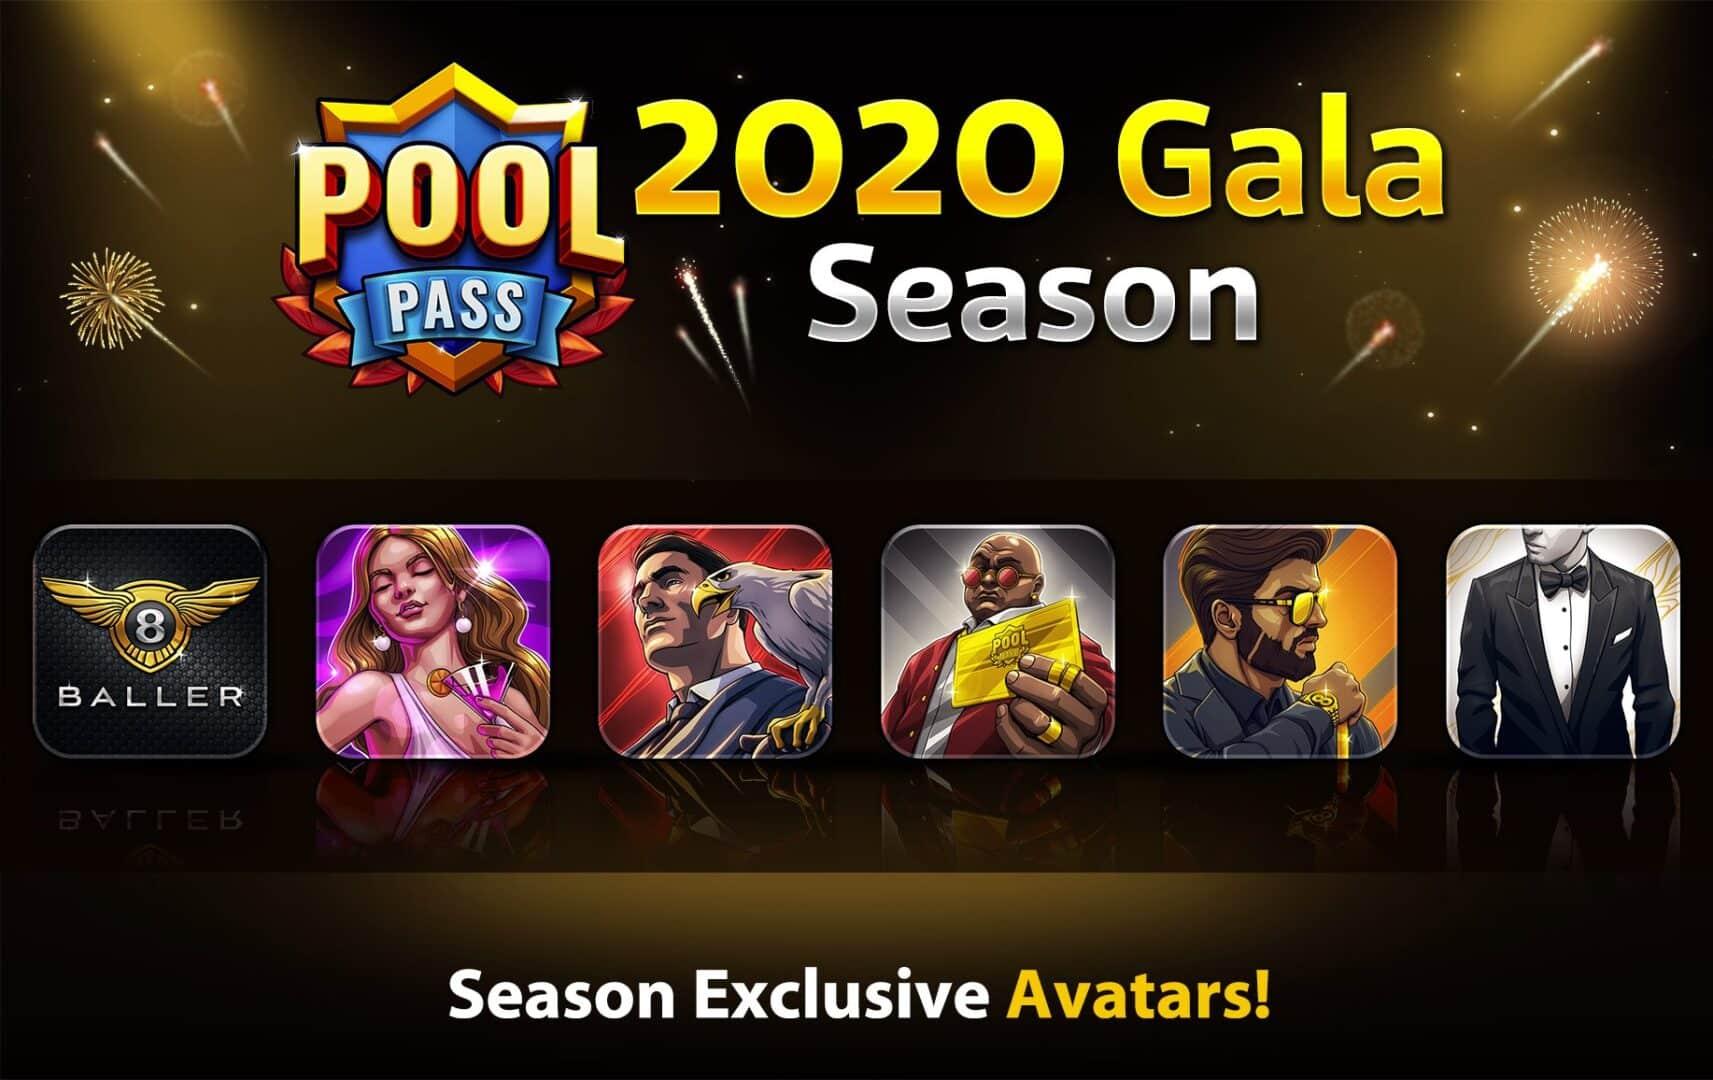 2020 gala season avatar